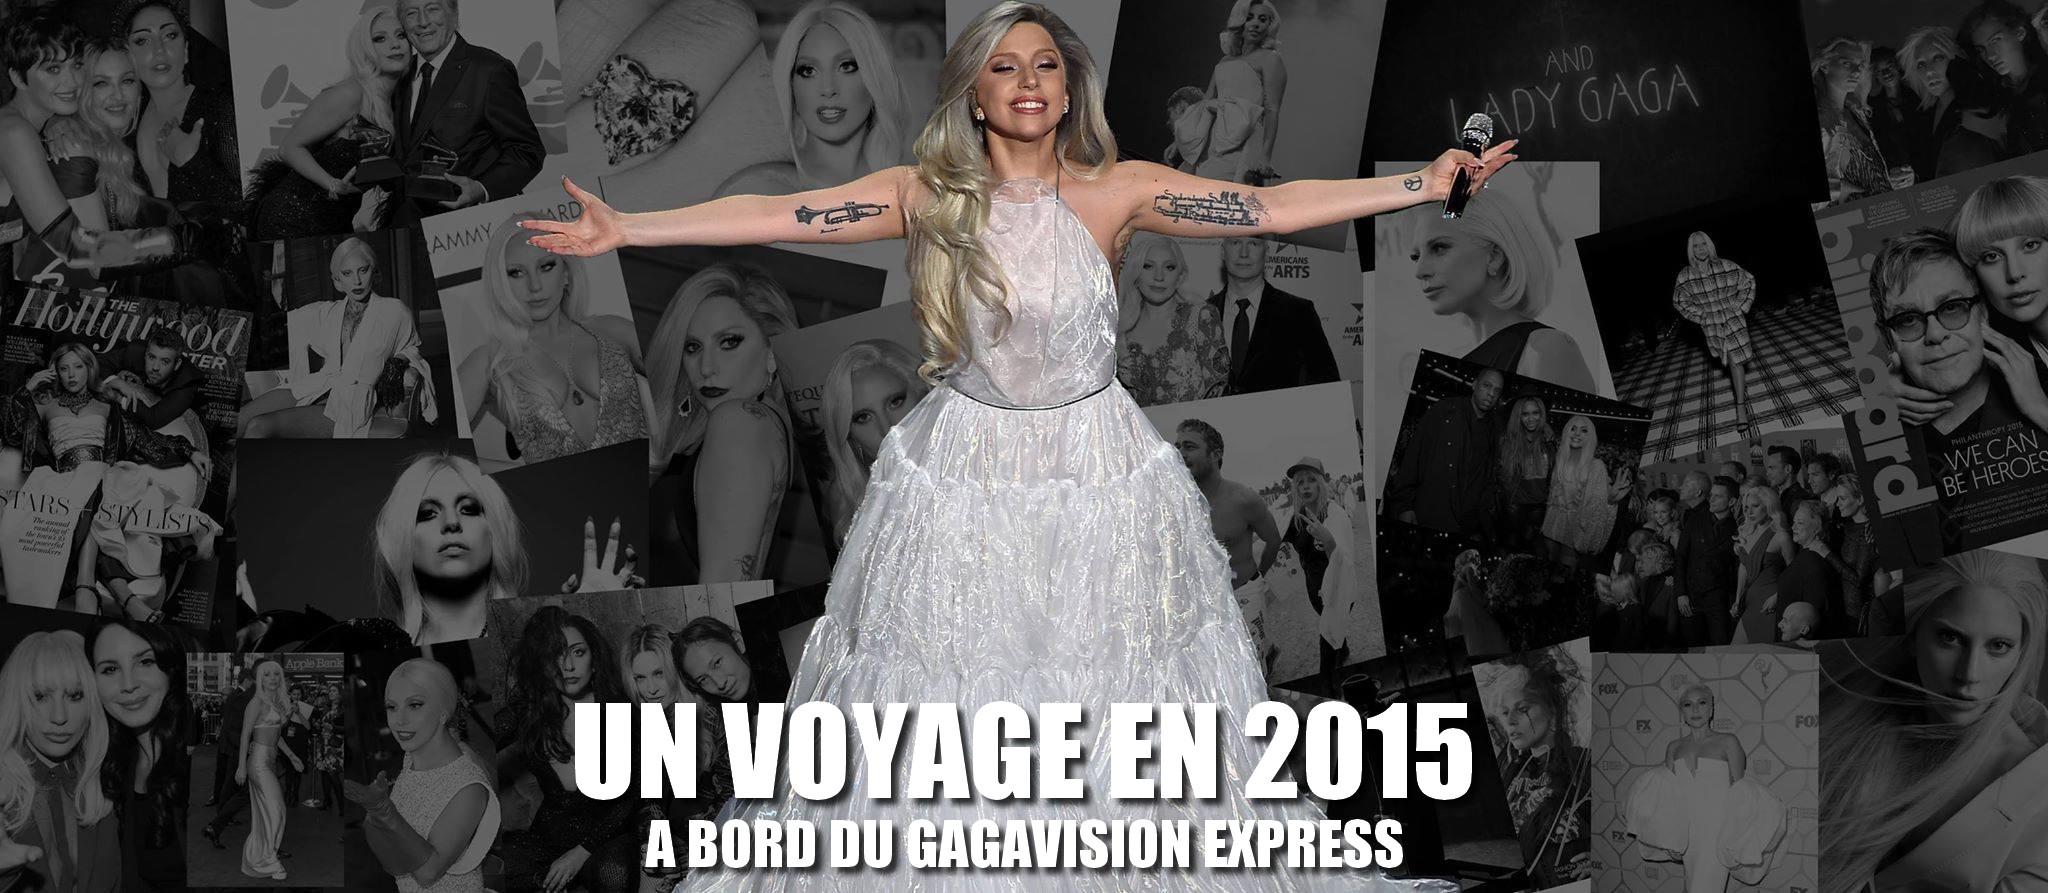 Rétrospective // Un voyage en 2015…